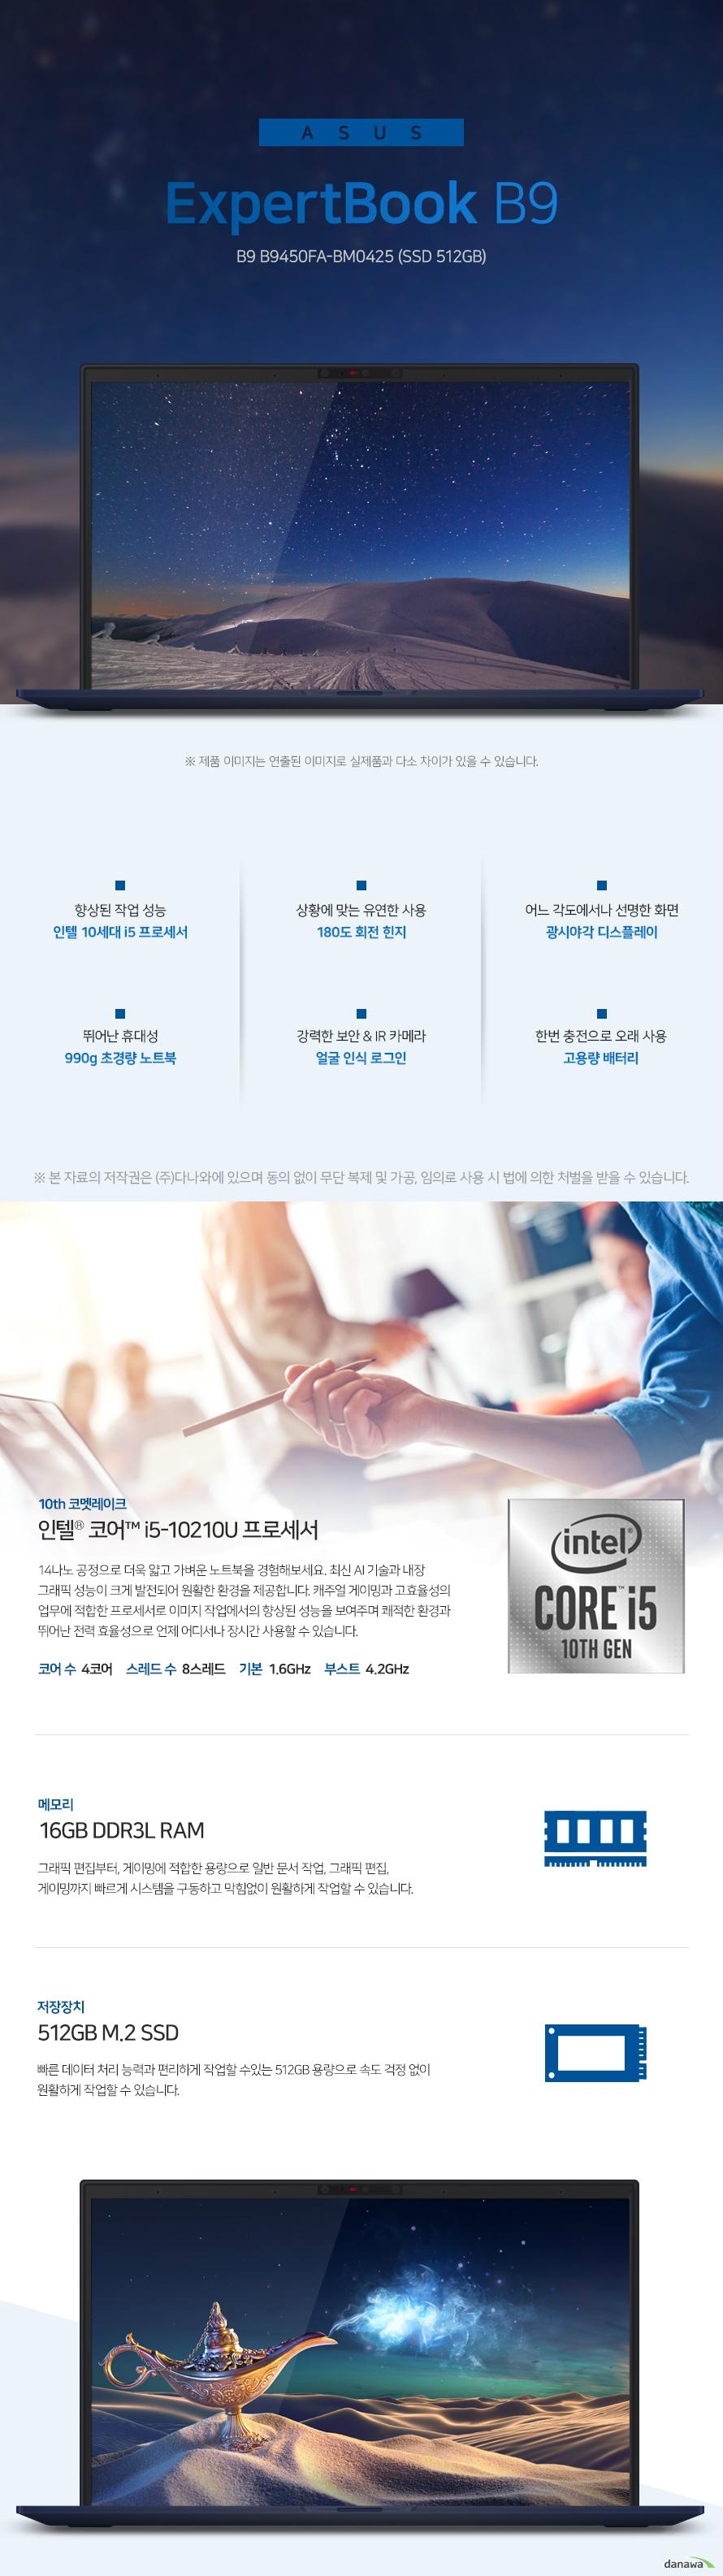 ASUS ExpertBook B9 B9450FA-BM0425 (SSD 512GB)